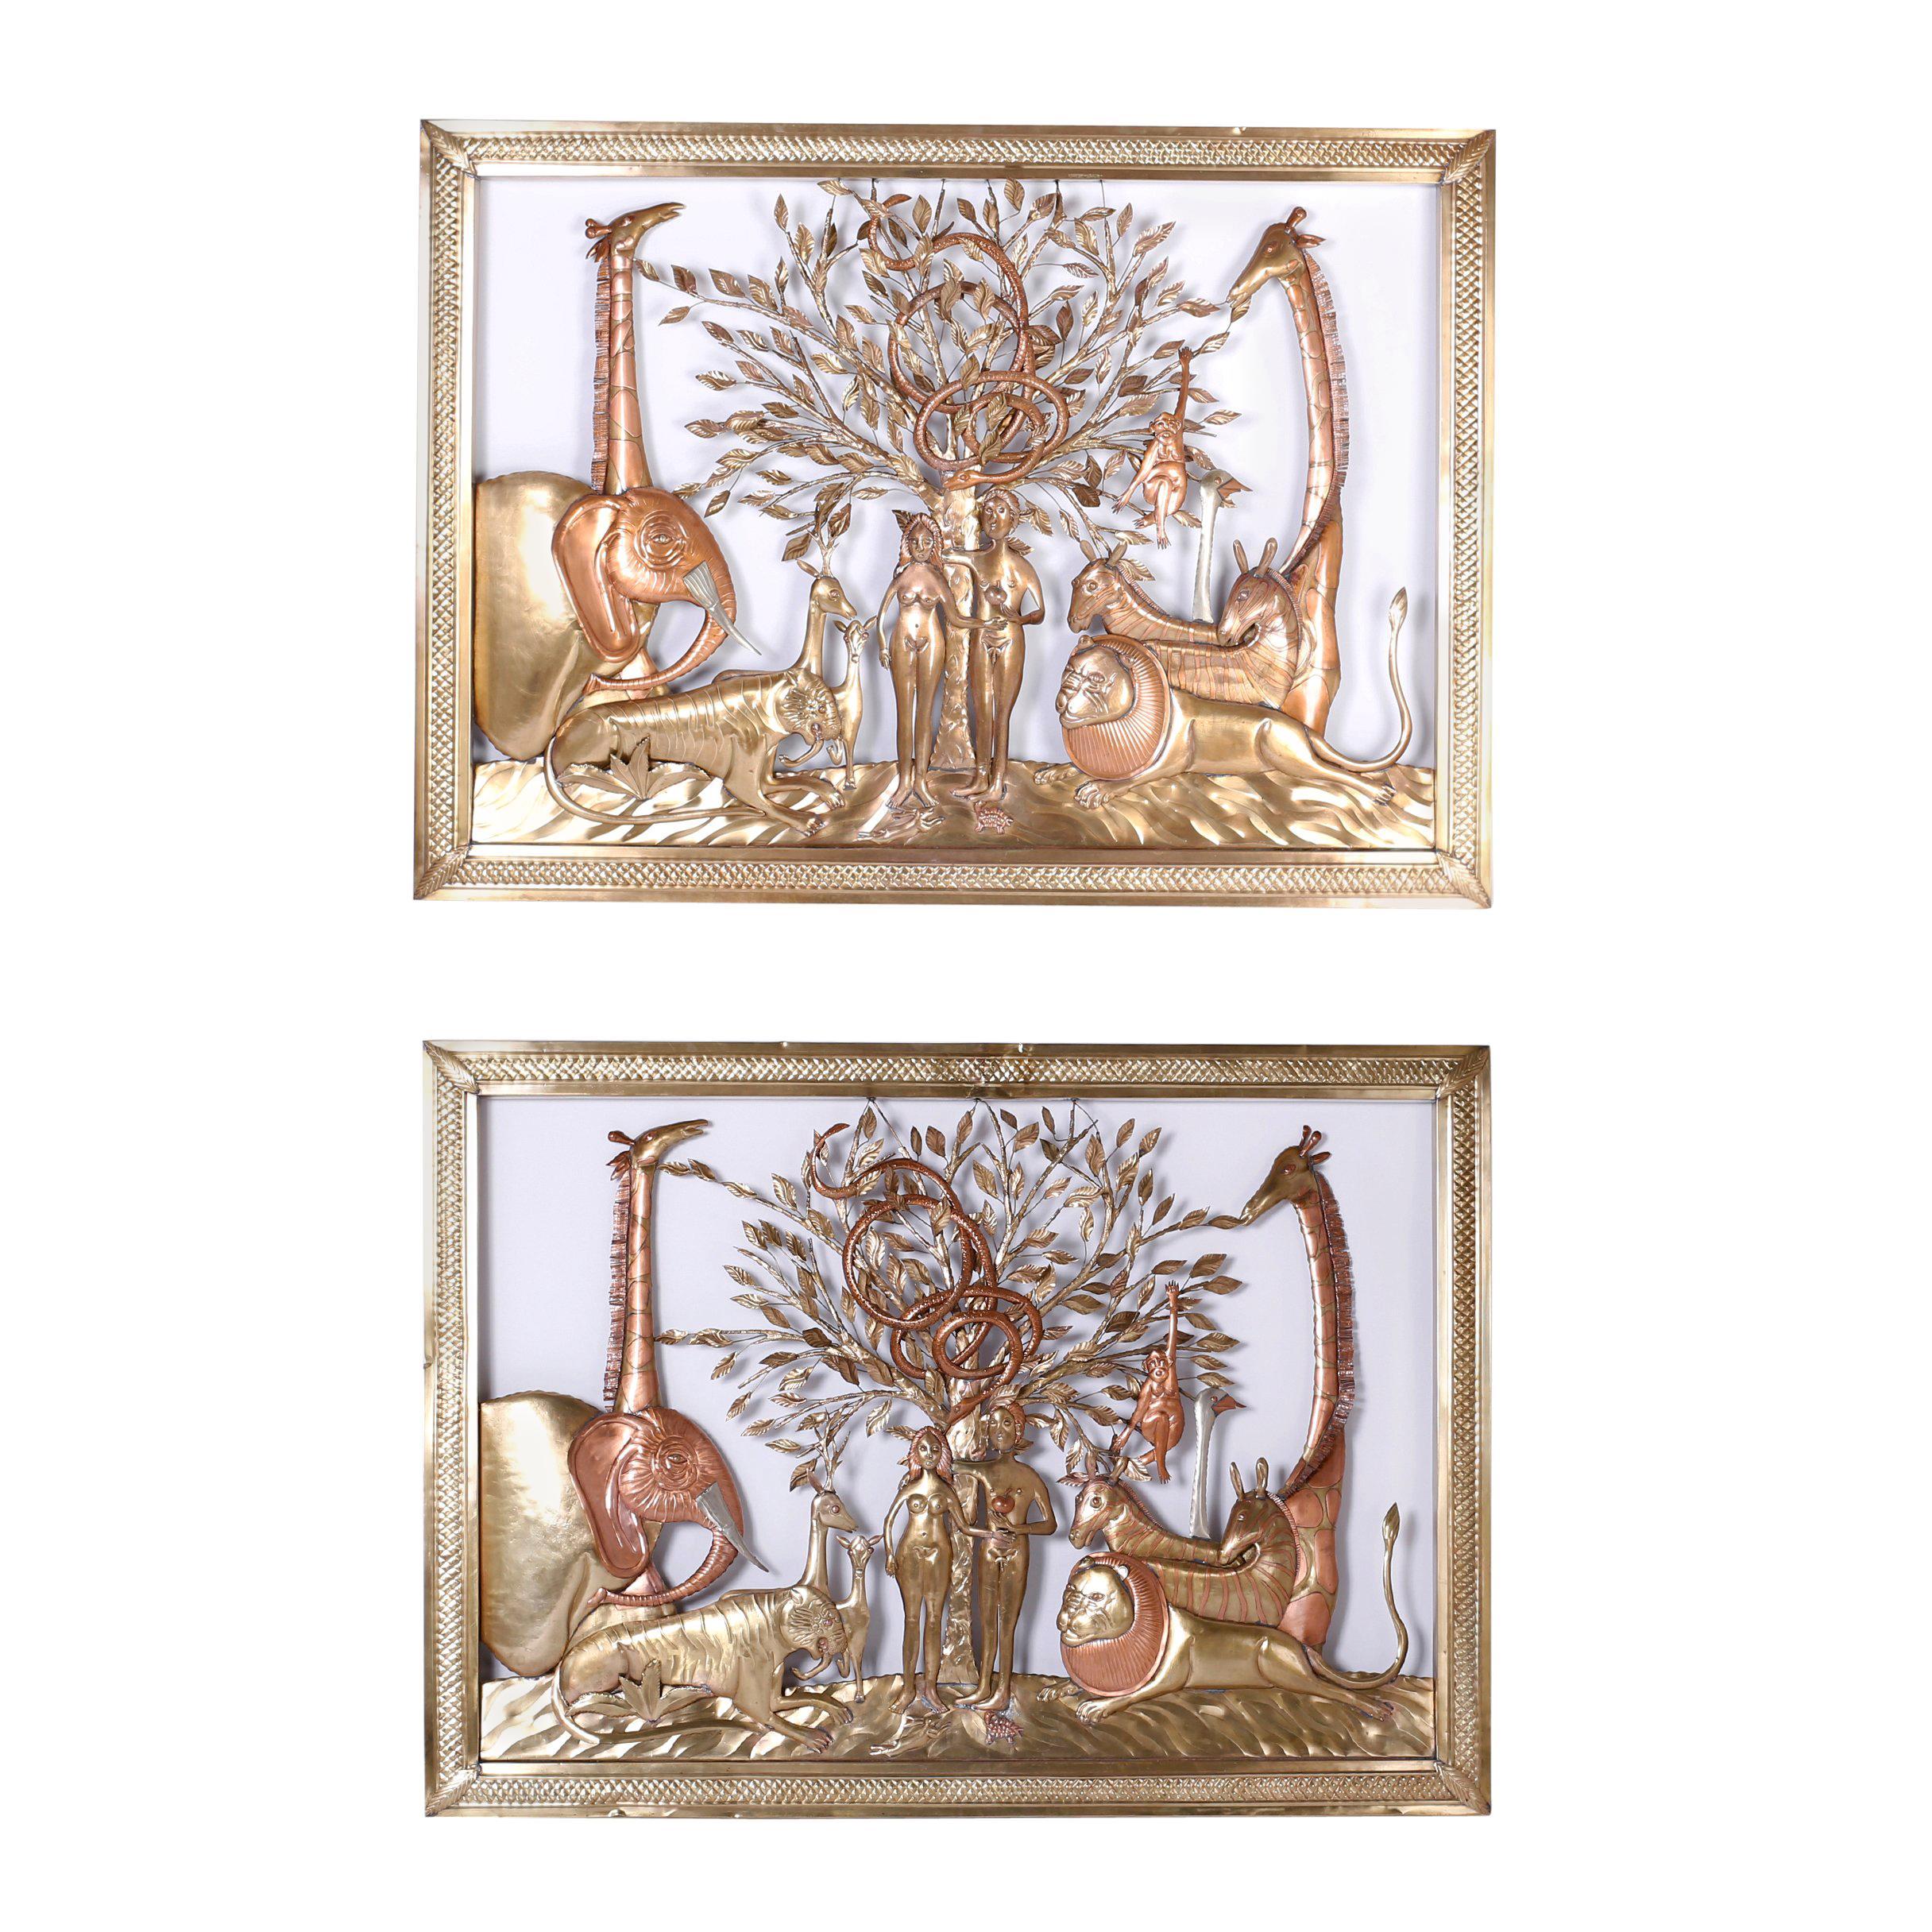 Pair of Midcentury Bustamante Garden of Eden Sculptures, Priced Individually